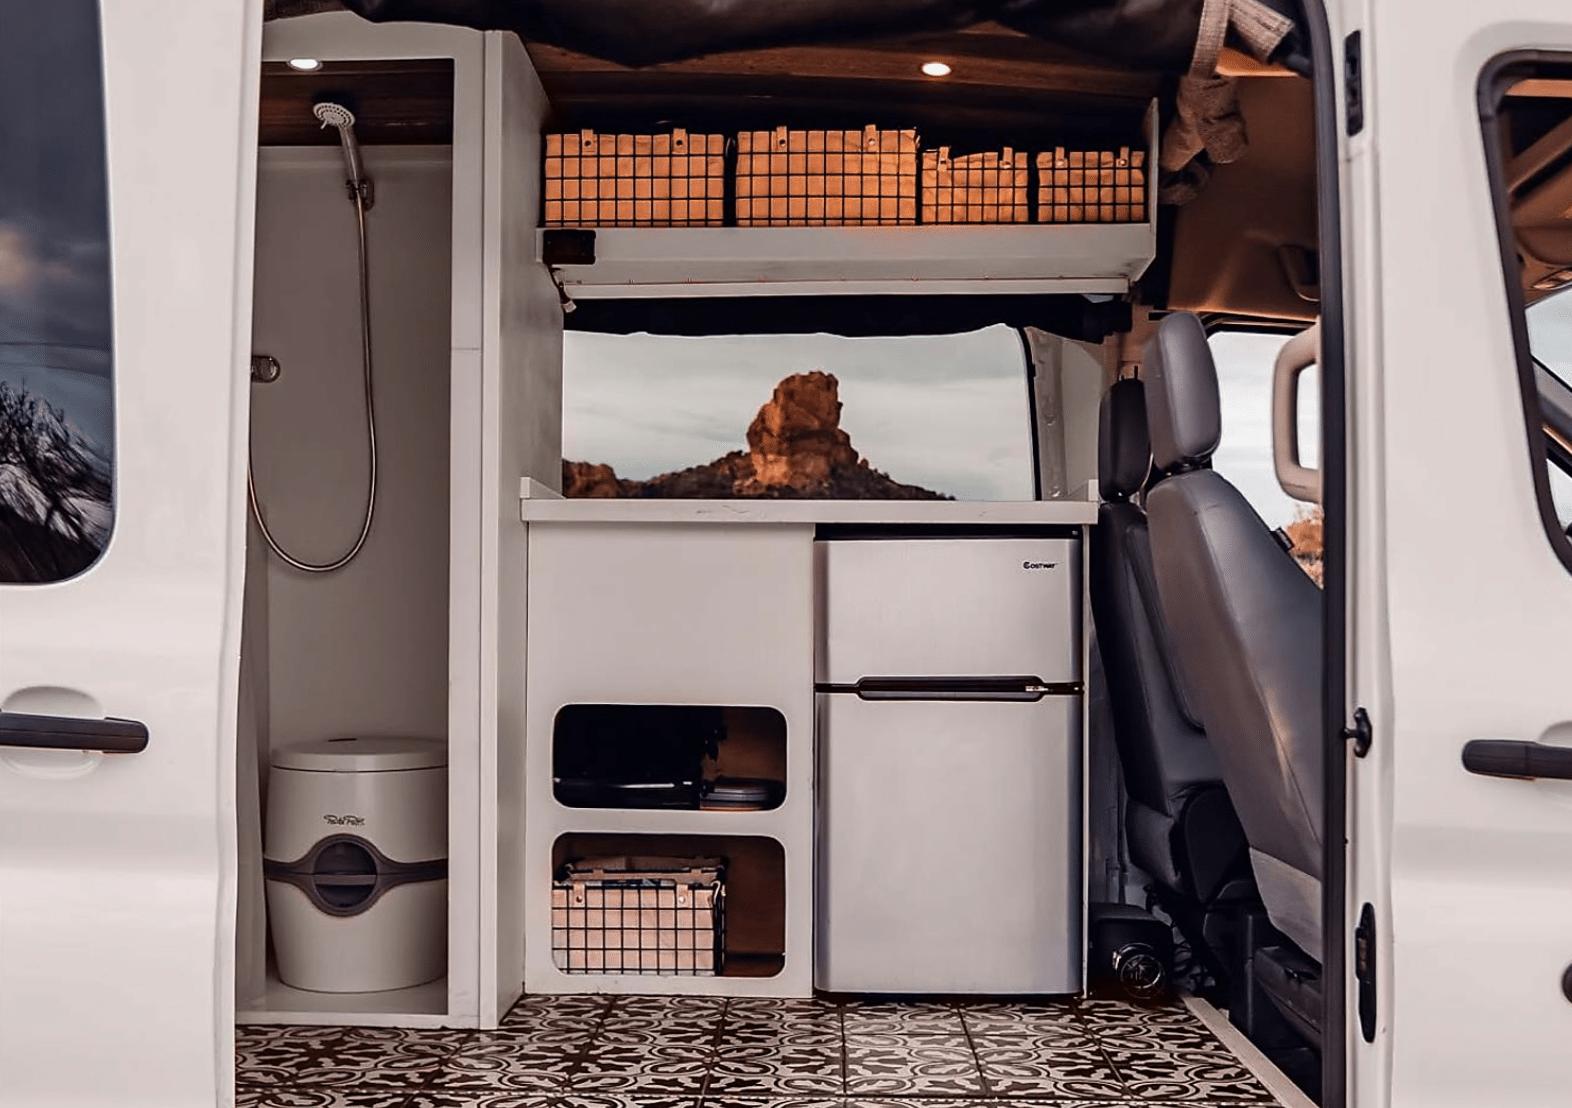 2015 Ford Transit Camper Van